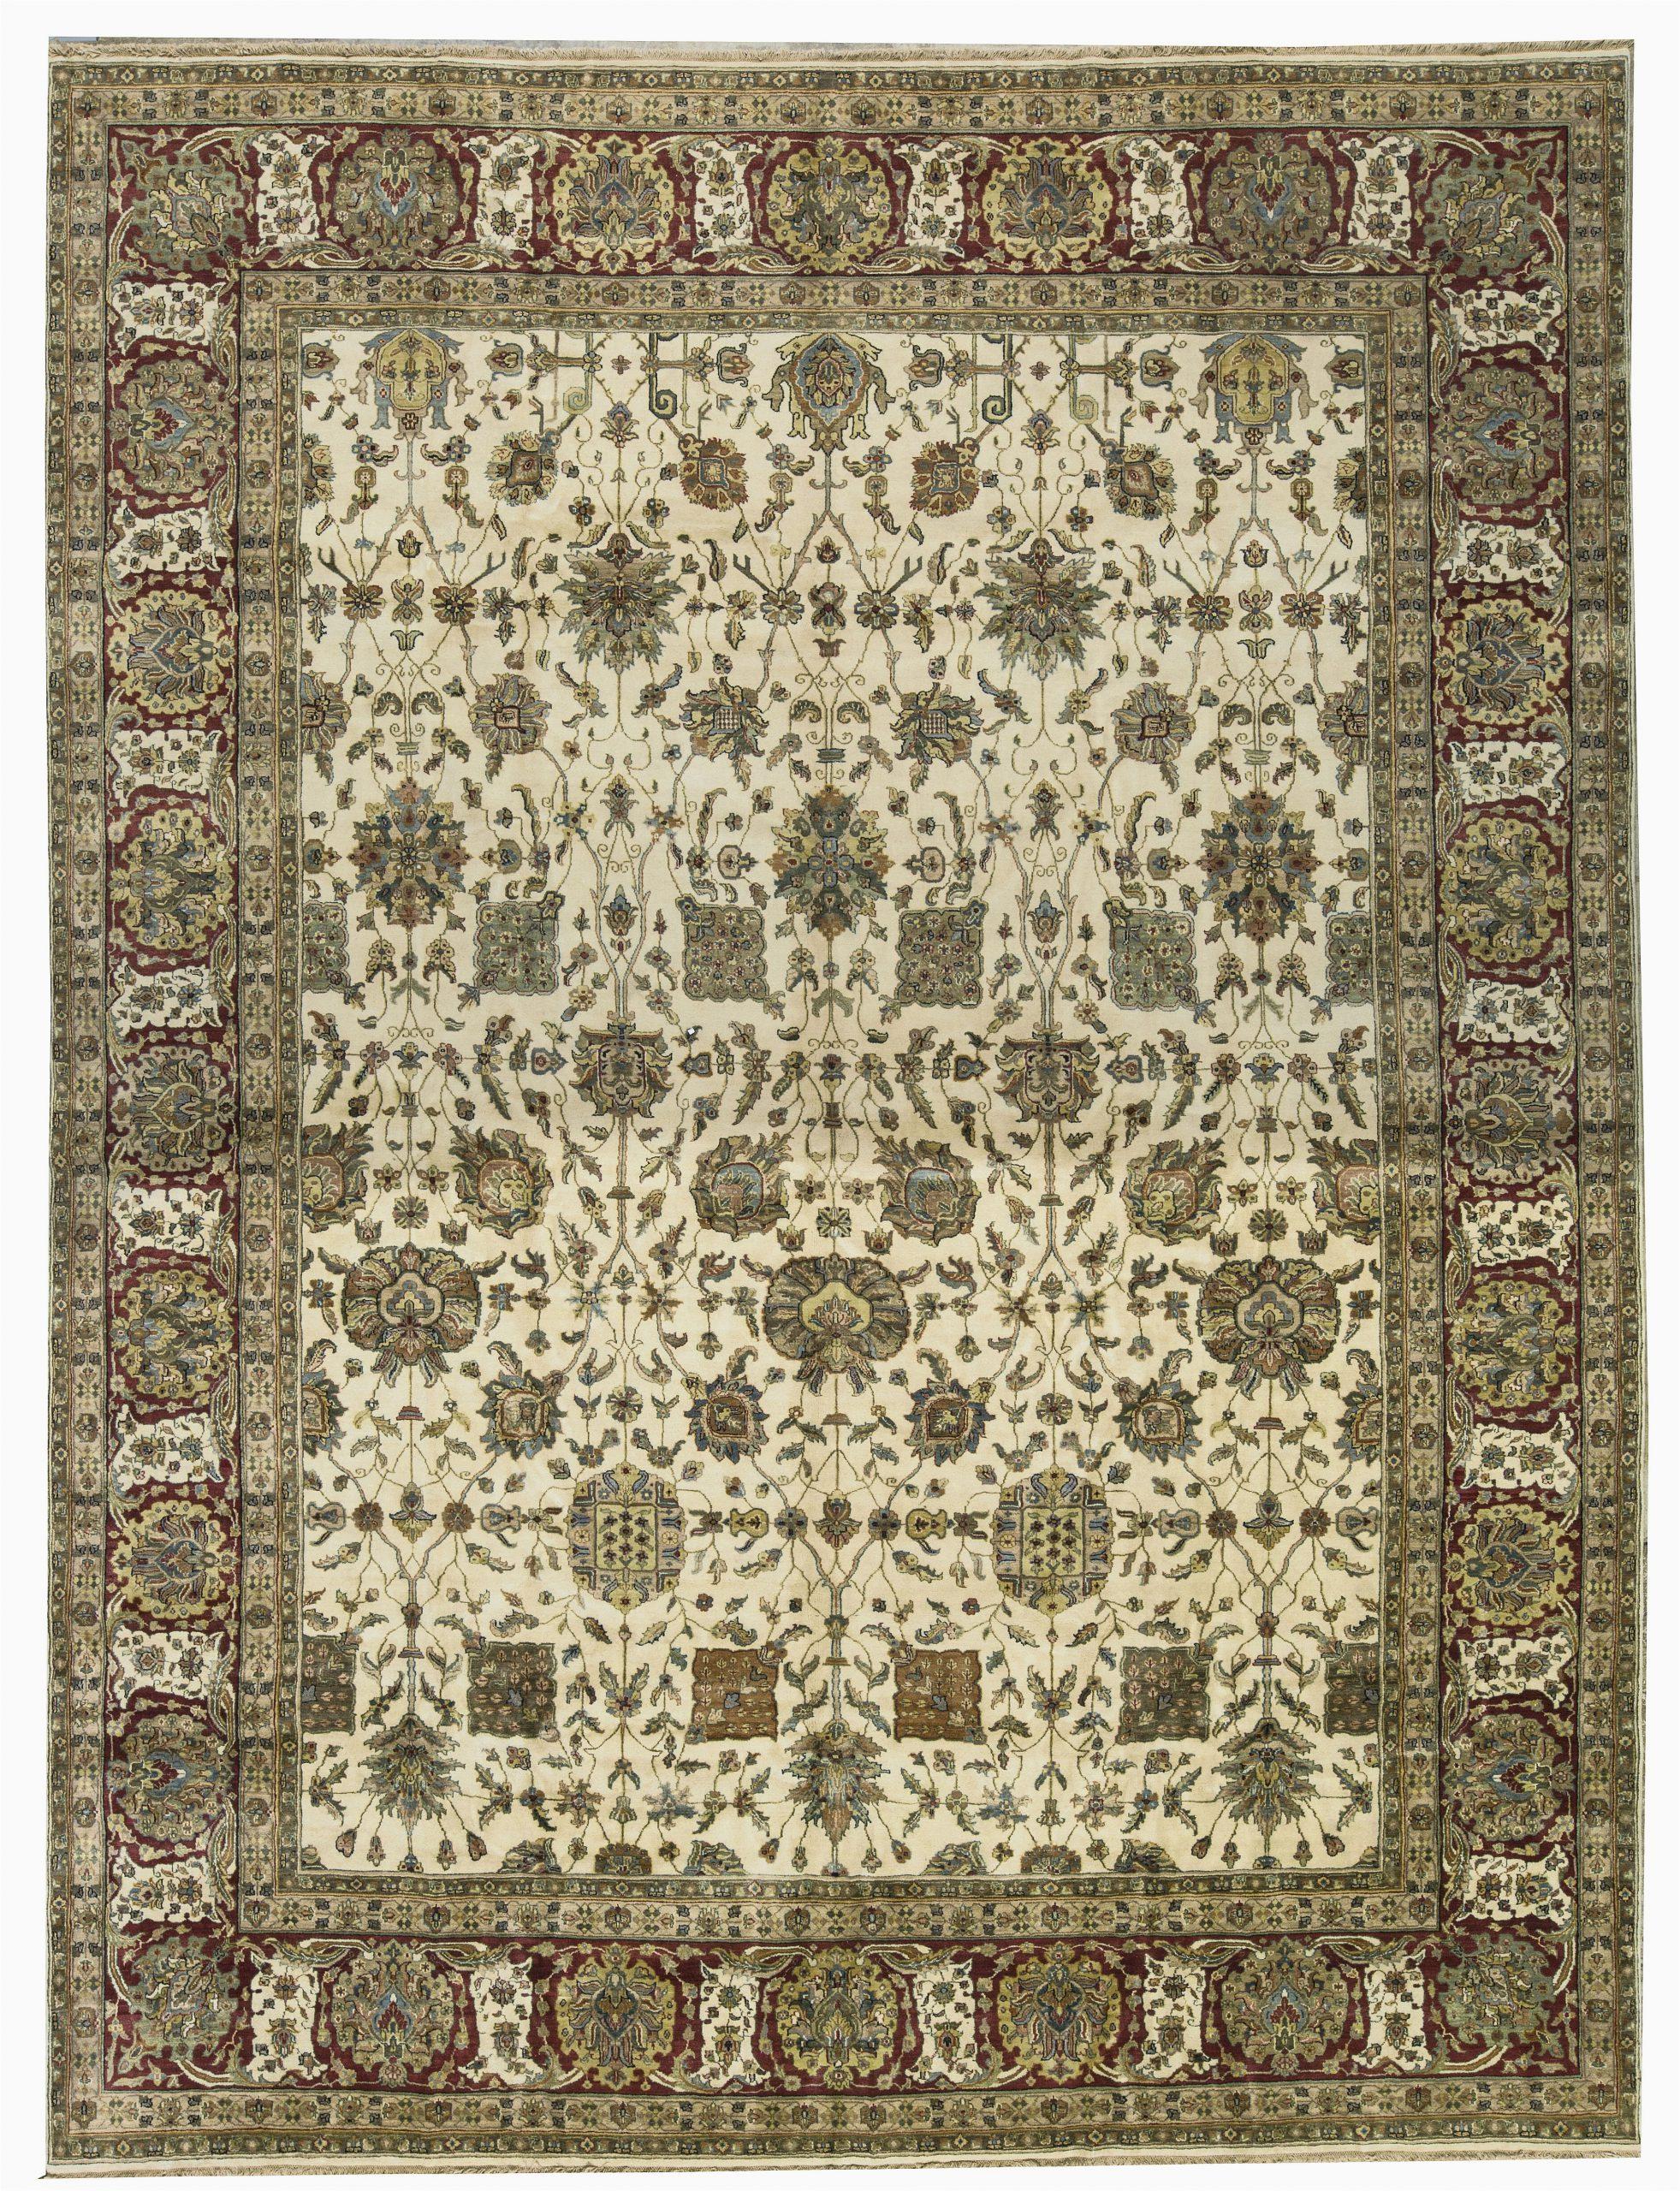 bokara rug co inc one of a kind sona handwoven 121 x 158 wool yellowbrown area rug abhd2489